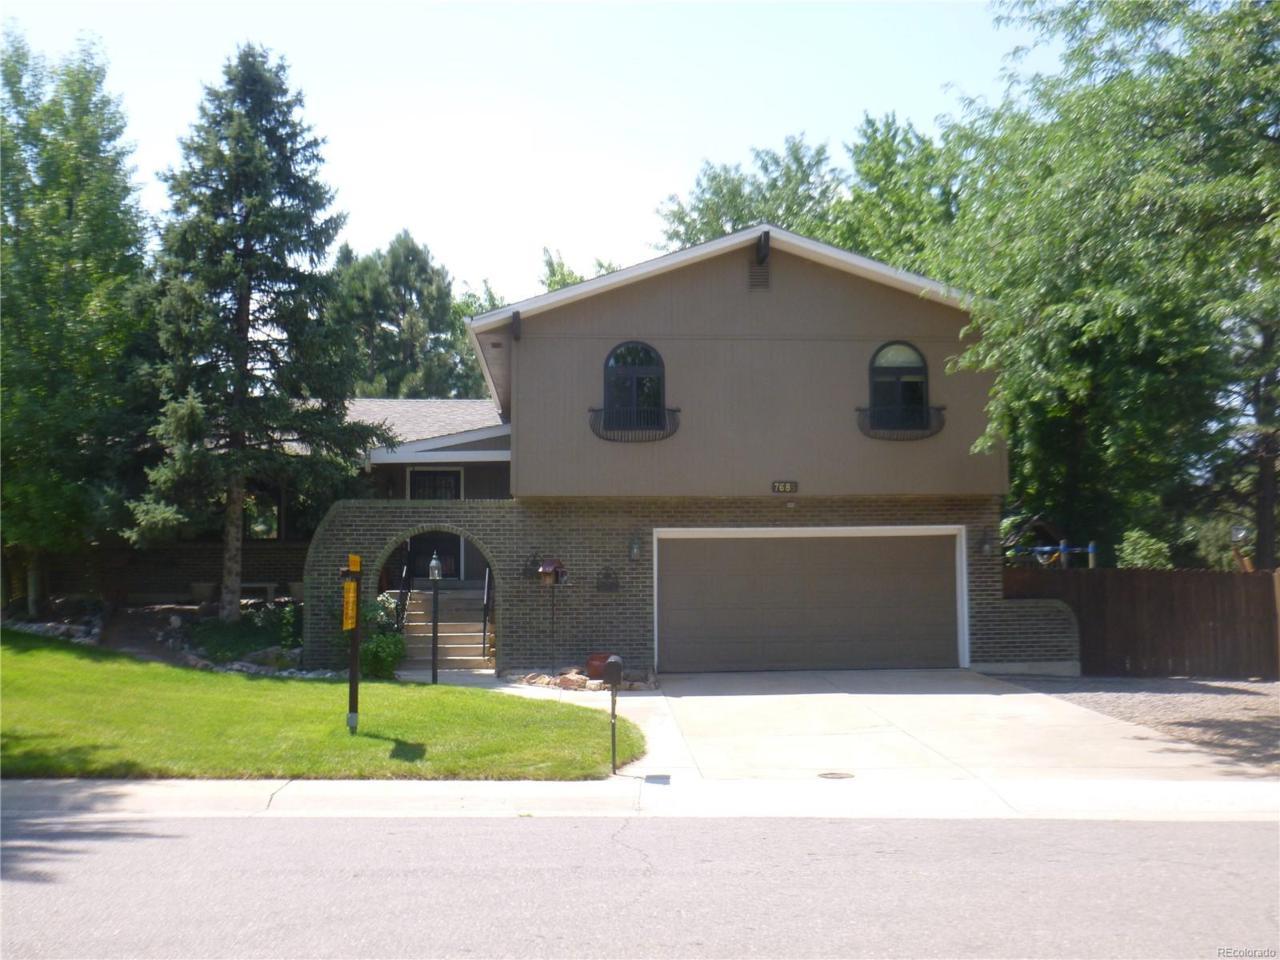 7685 S Datura Circle, Littleton, CO 80120 (MLS #2858753) :: 8z Real Estate